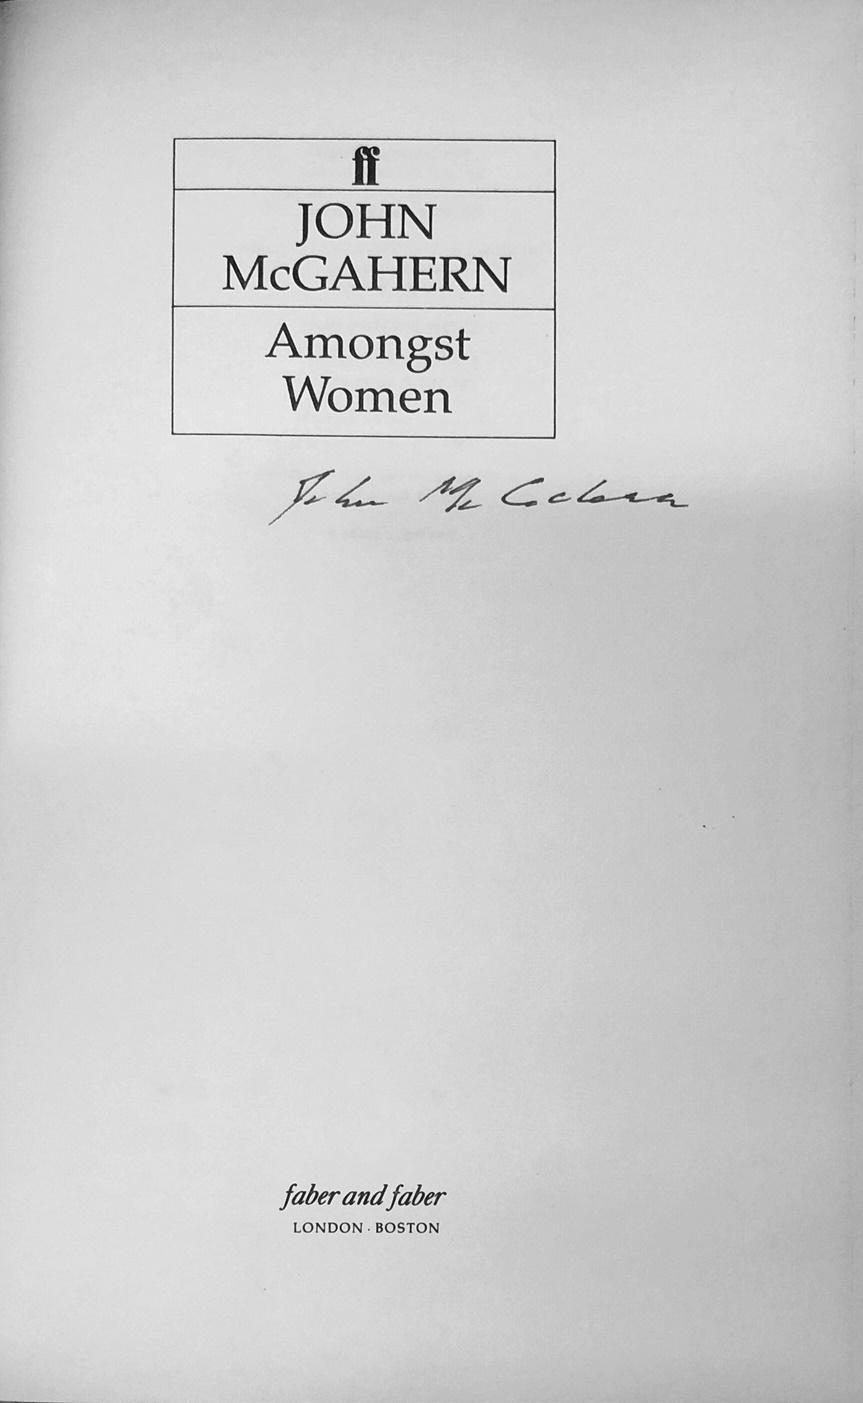 Lot 34 - Mc Gahern (John) Amongst Women, roy 8vo L. (Faber & Faber) 1990. First Edn. - Signed, d.w.